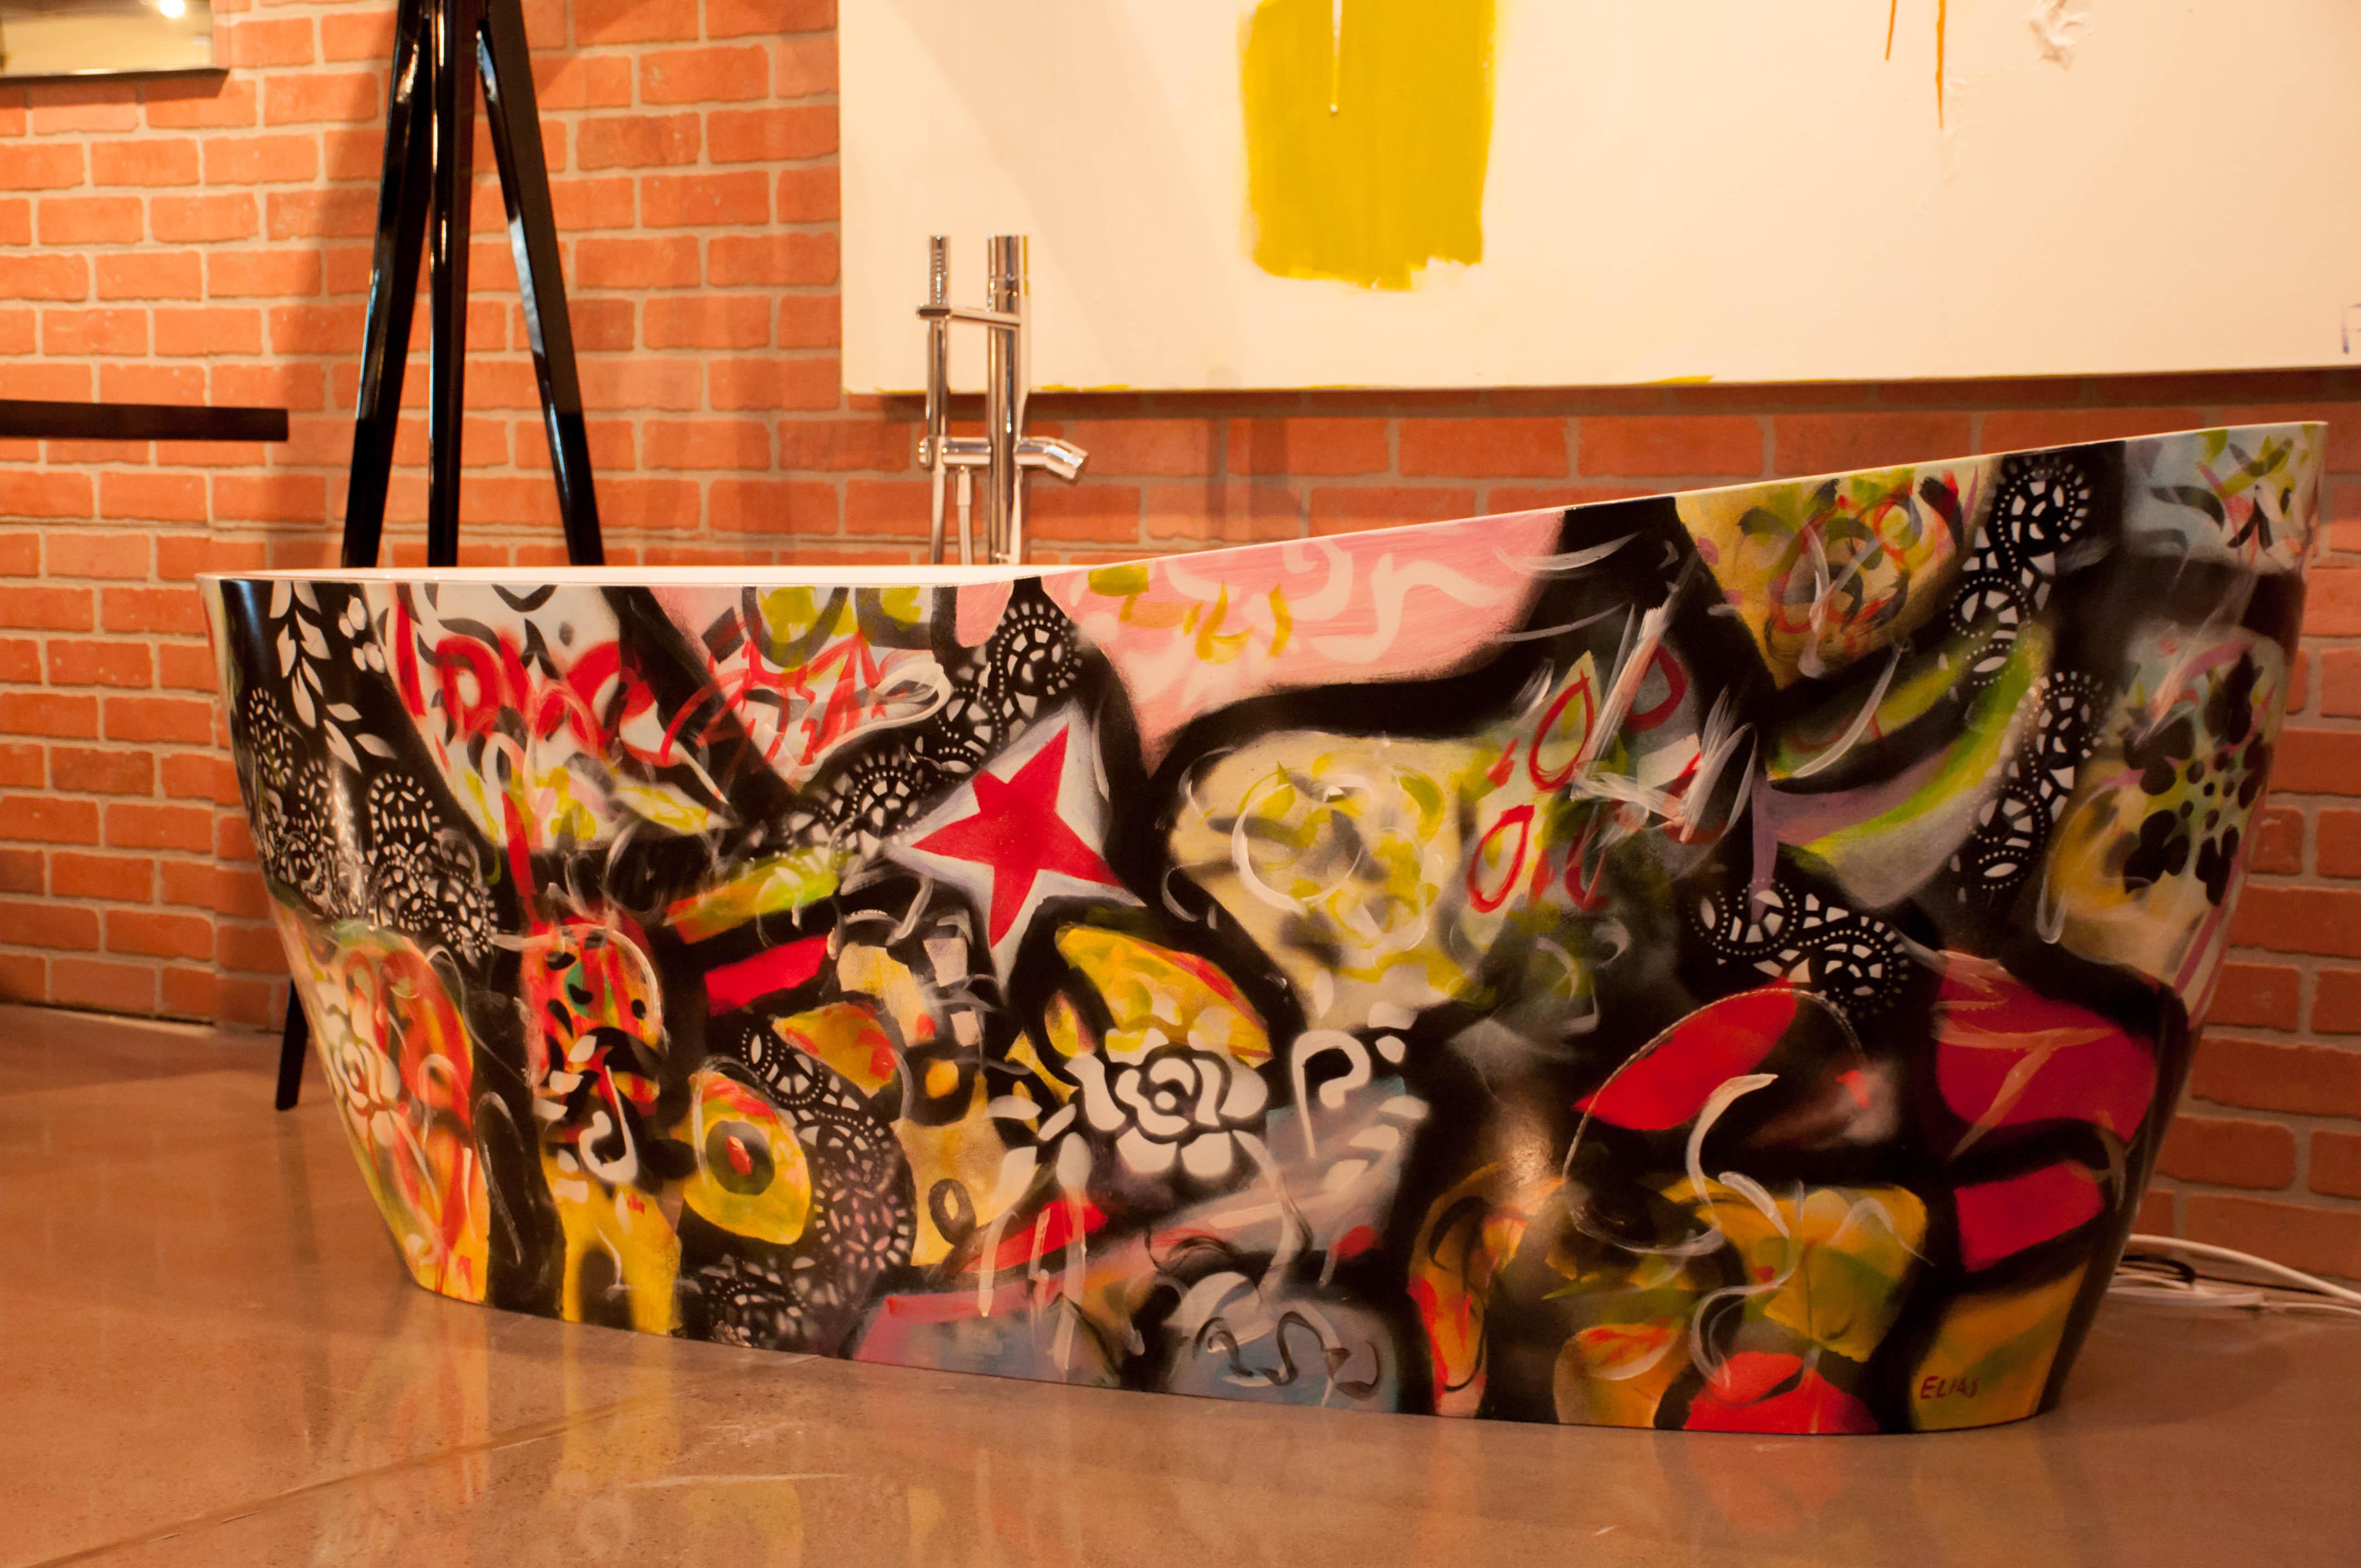 Graffiti Tub